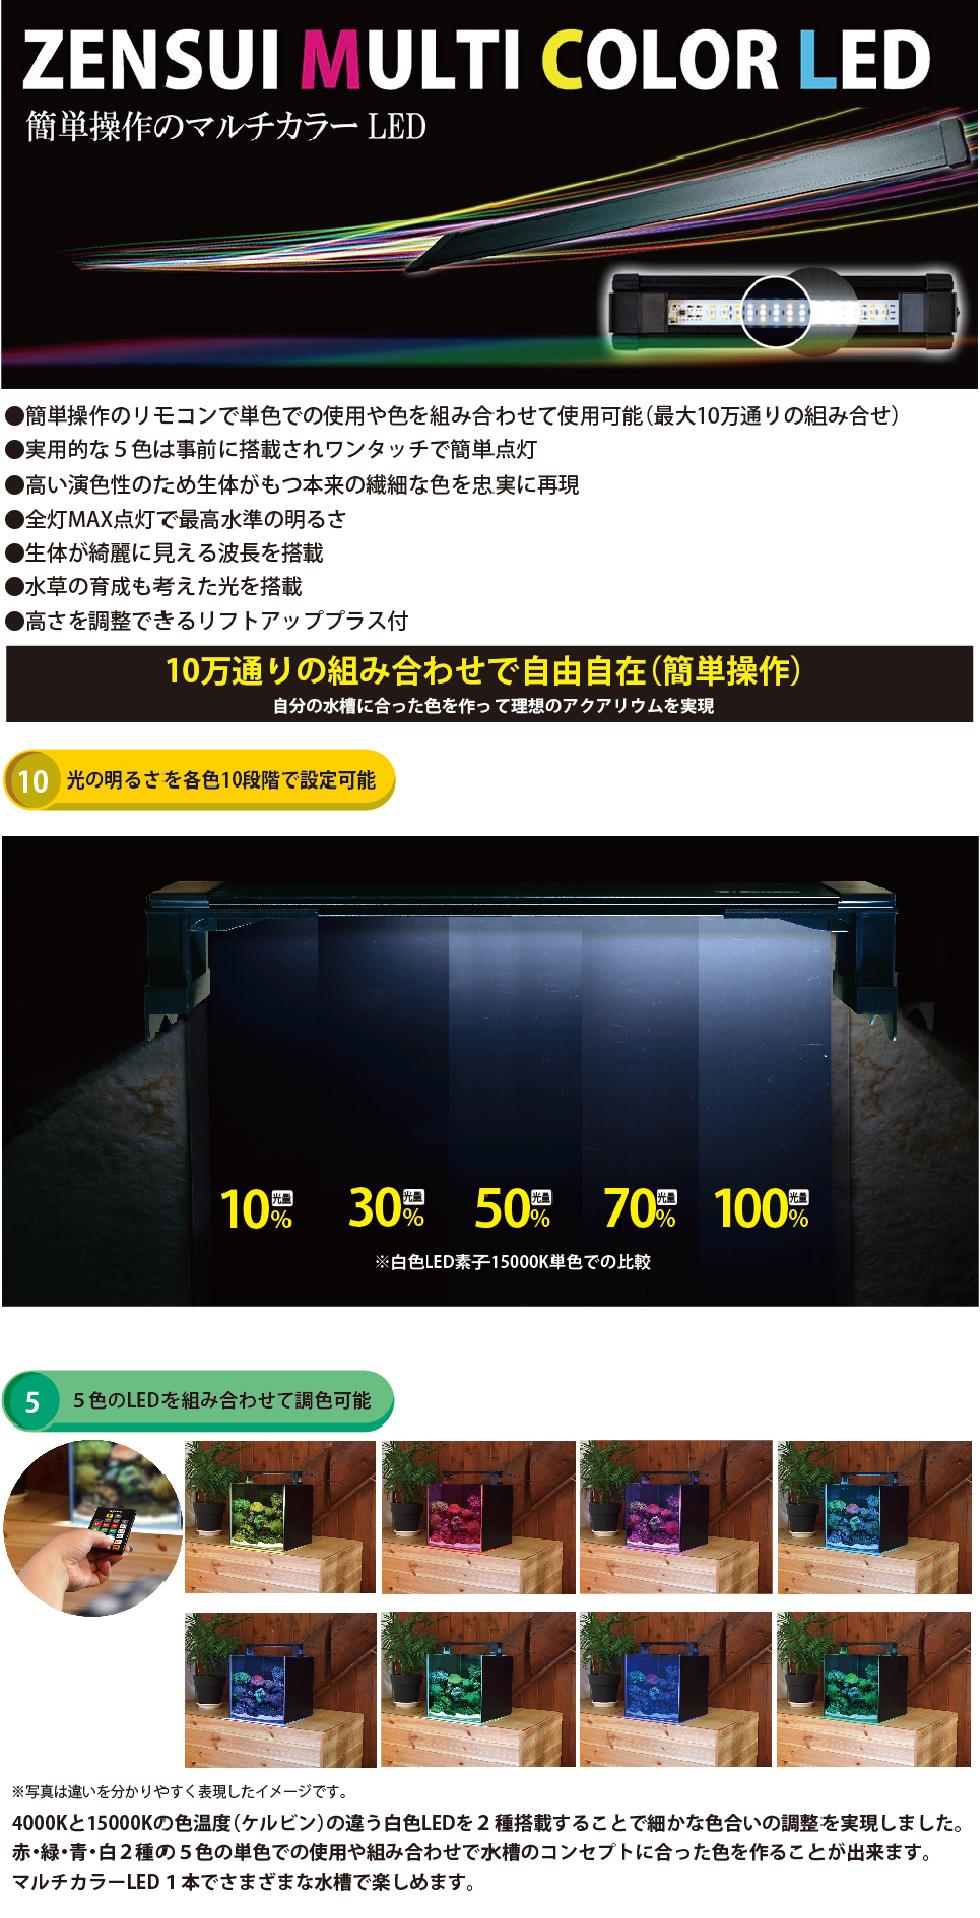 ZENSUI MULTI COLOR LED / ゼンスイ マルチカラー LED